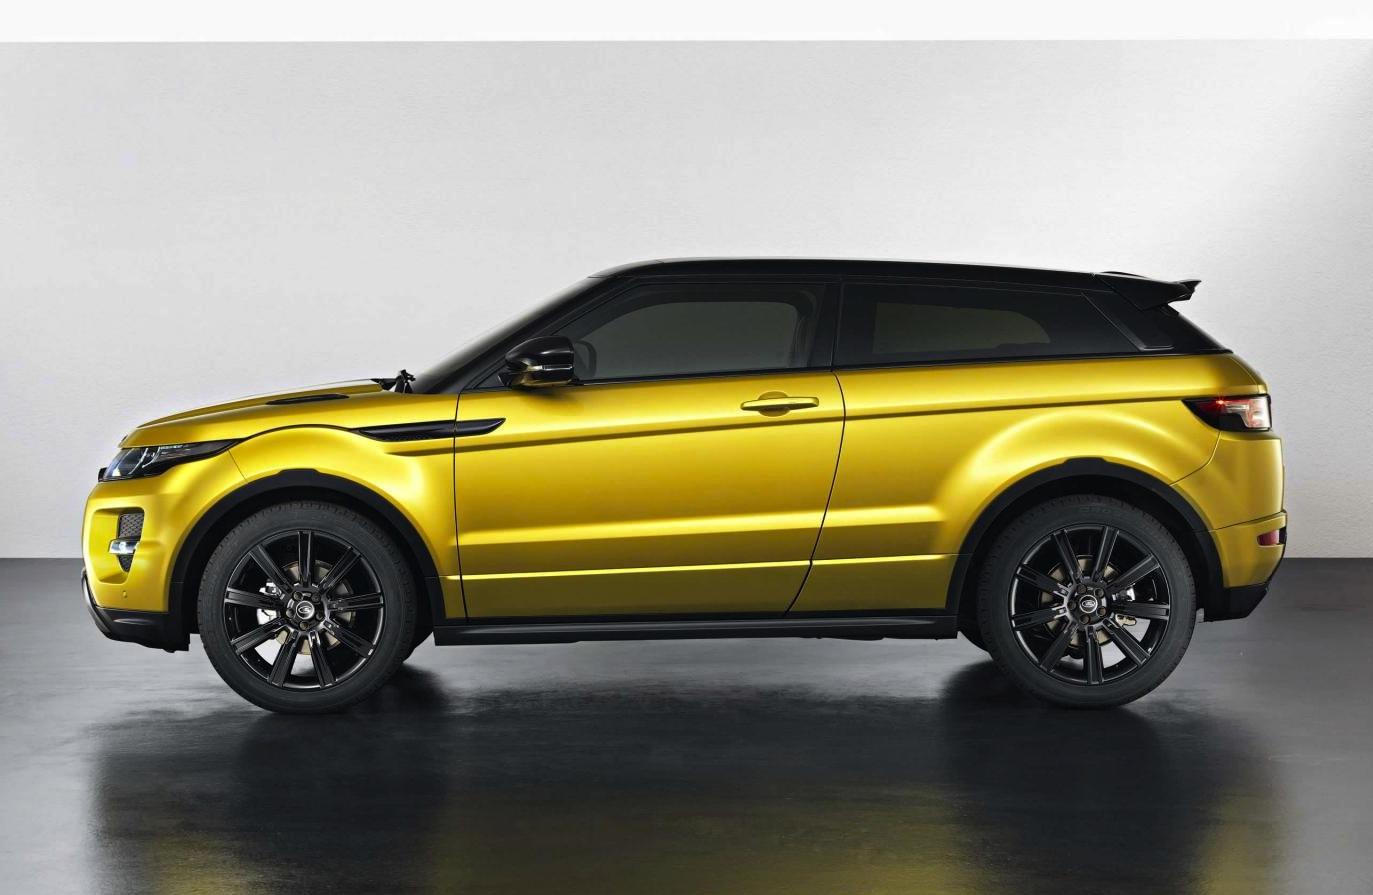 Range Rover Evoque Sicilian Yellow Edition On Sale Q3